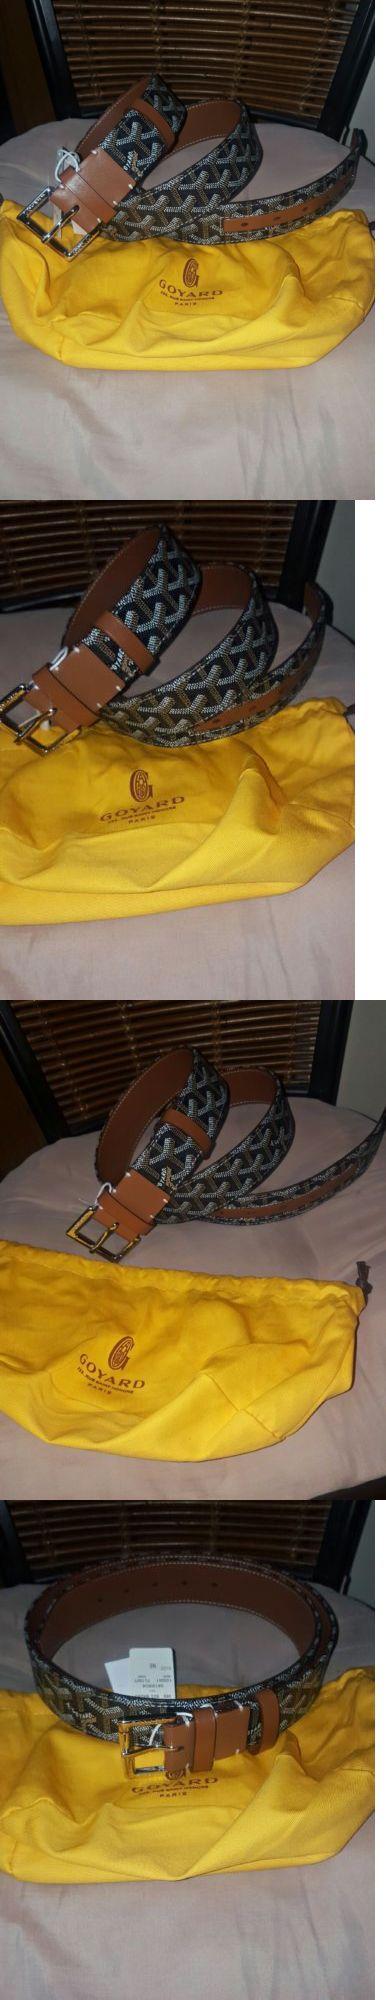 Belts 2993: Goyard Mens Brown Monogram Leather Belt 100Cm (34-36) -> BUY IT NOW ONLY: $239.99 on eBay!